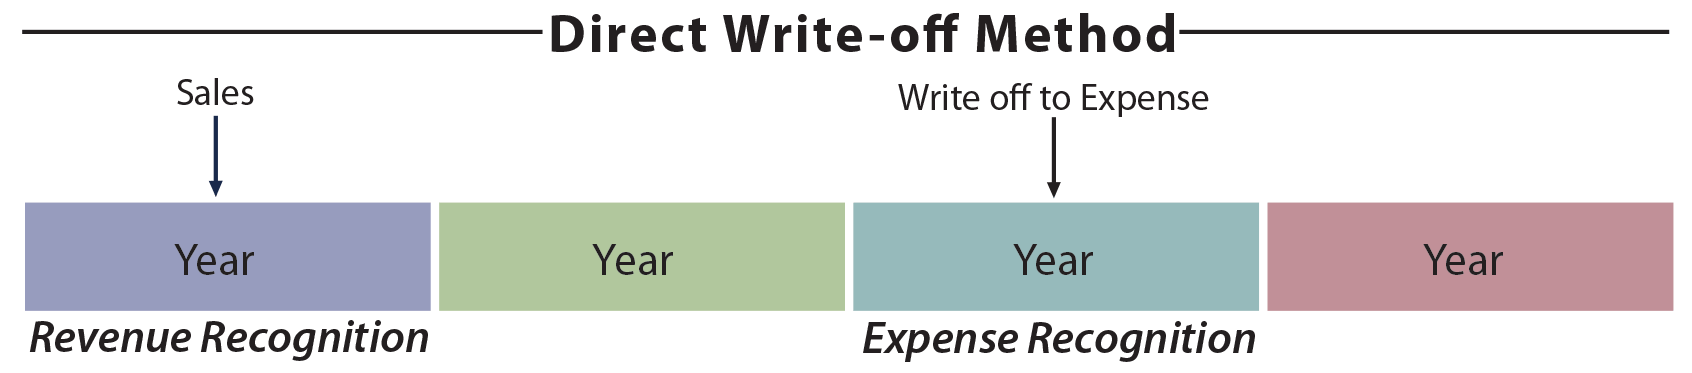 Direct Write-Off Method illustration